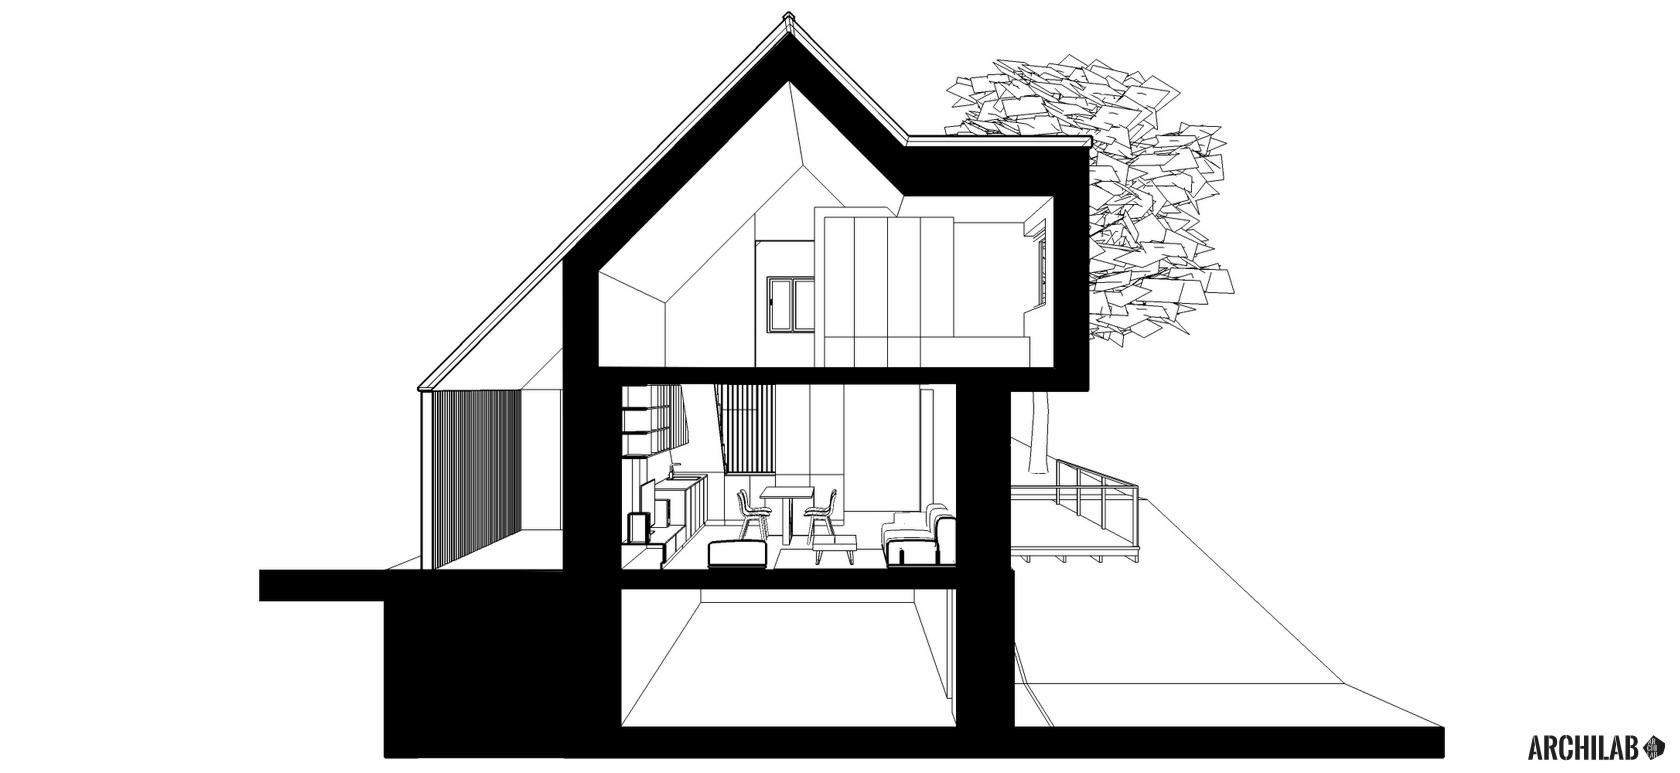 rodinny-dom-rekonstrukcia-horne-prsany-rezopohlad-od-architekta-moderny-dizajn-archilab-01